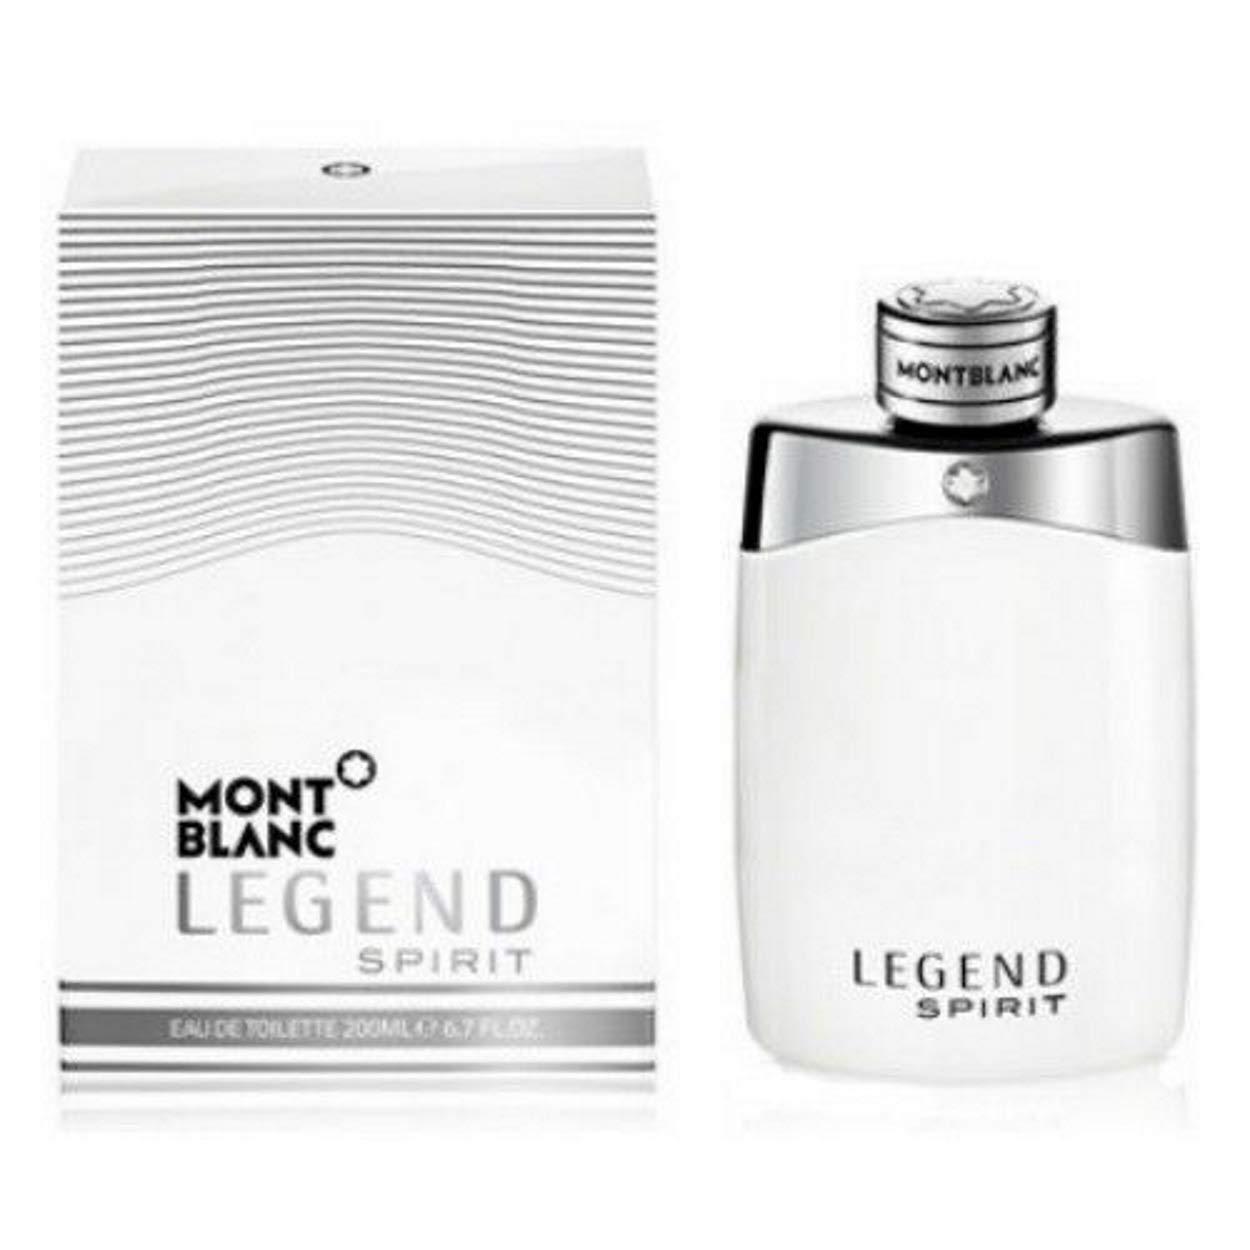 Mont Blanc Legend Spirit EDT Cologne for Men 6.7 OZ.